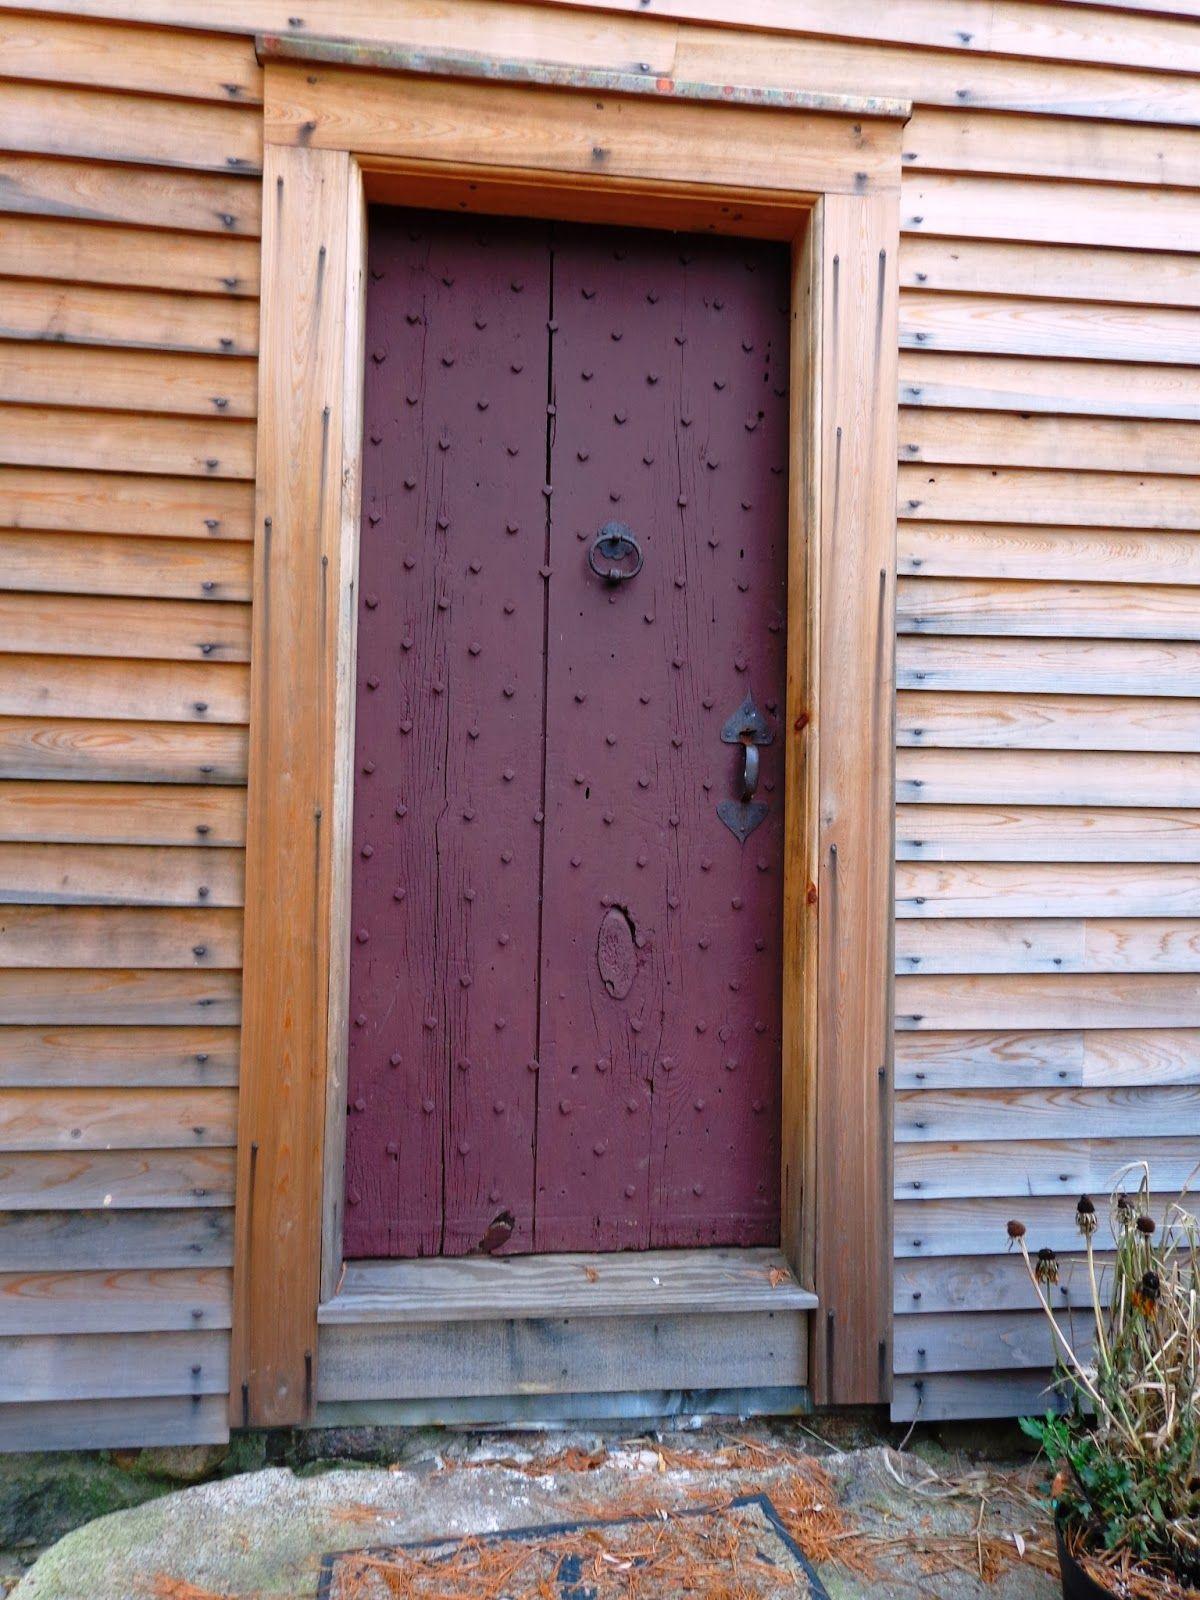 Reproduction Postmedieval English Colonial Vertical Board Batten Door.